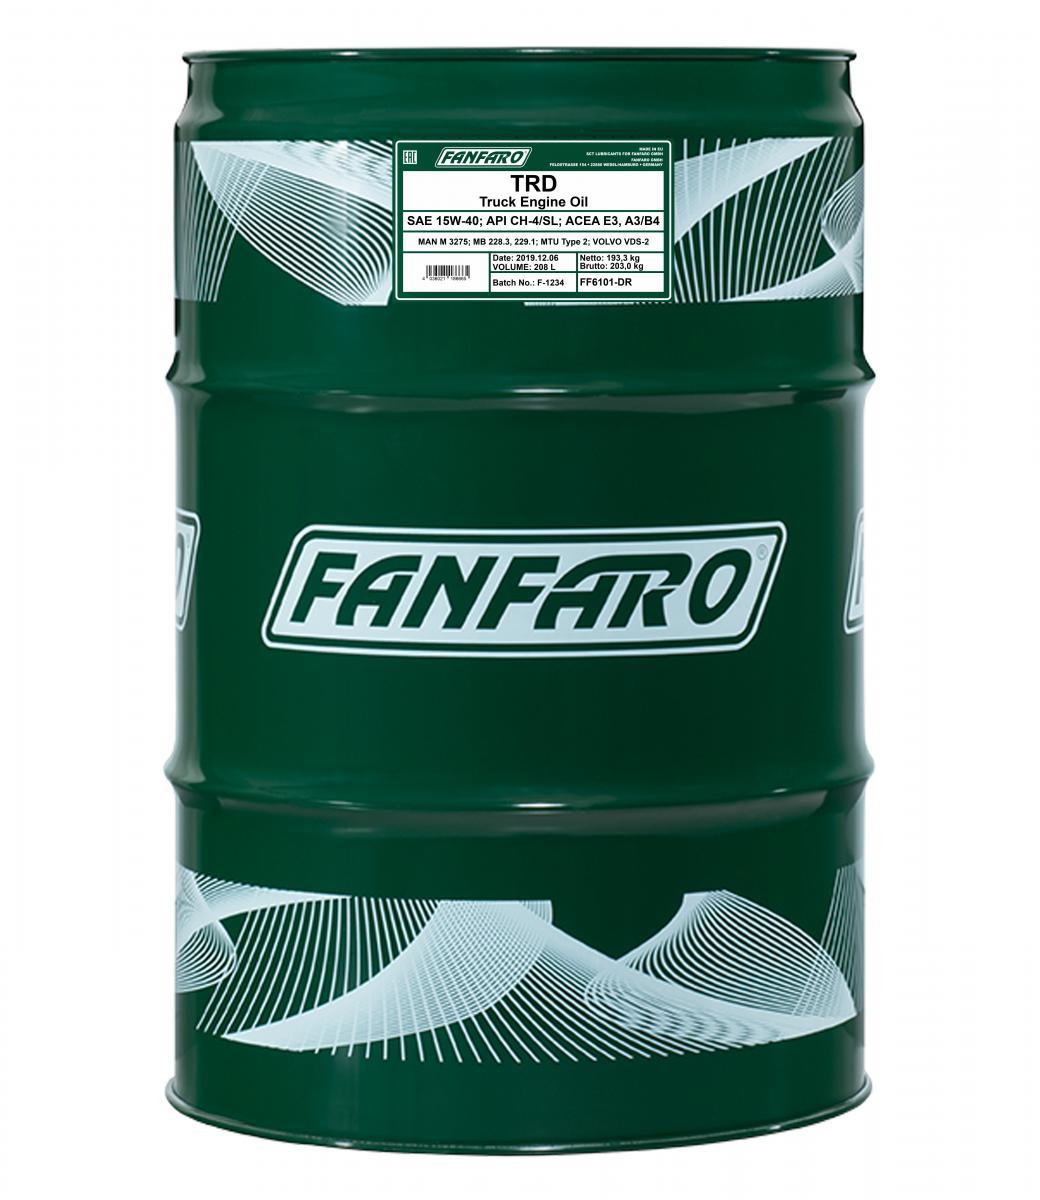 FF6101-DR FANFARO SHPD, TRD 15W-40, 208l, Mineralöl Motoröl FF6101-DR günstig kaufen